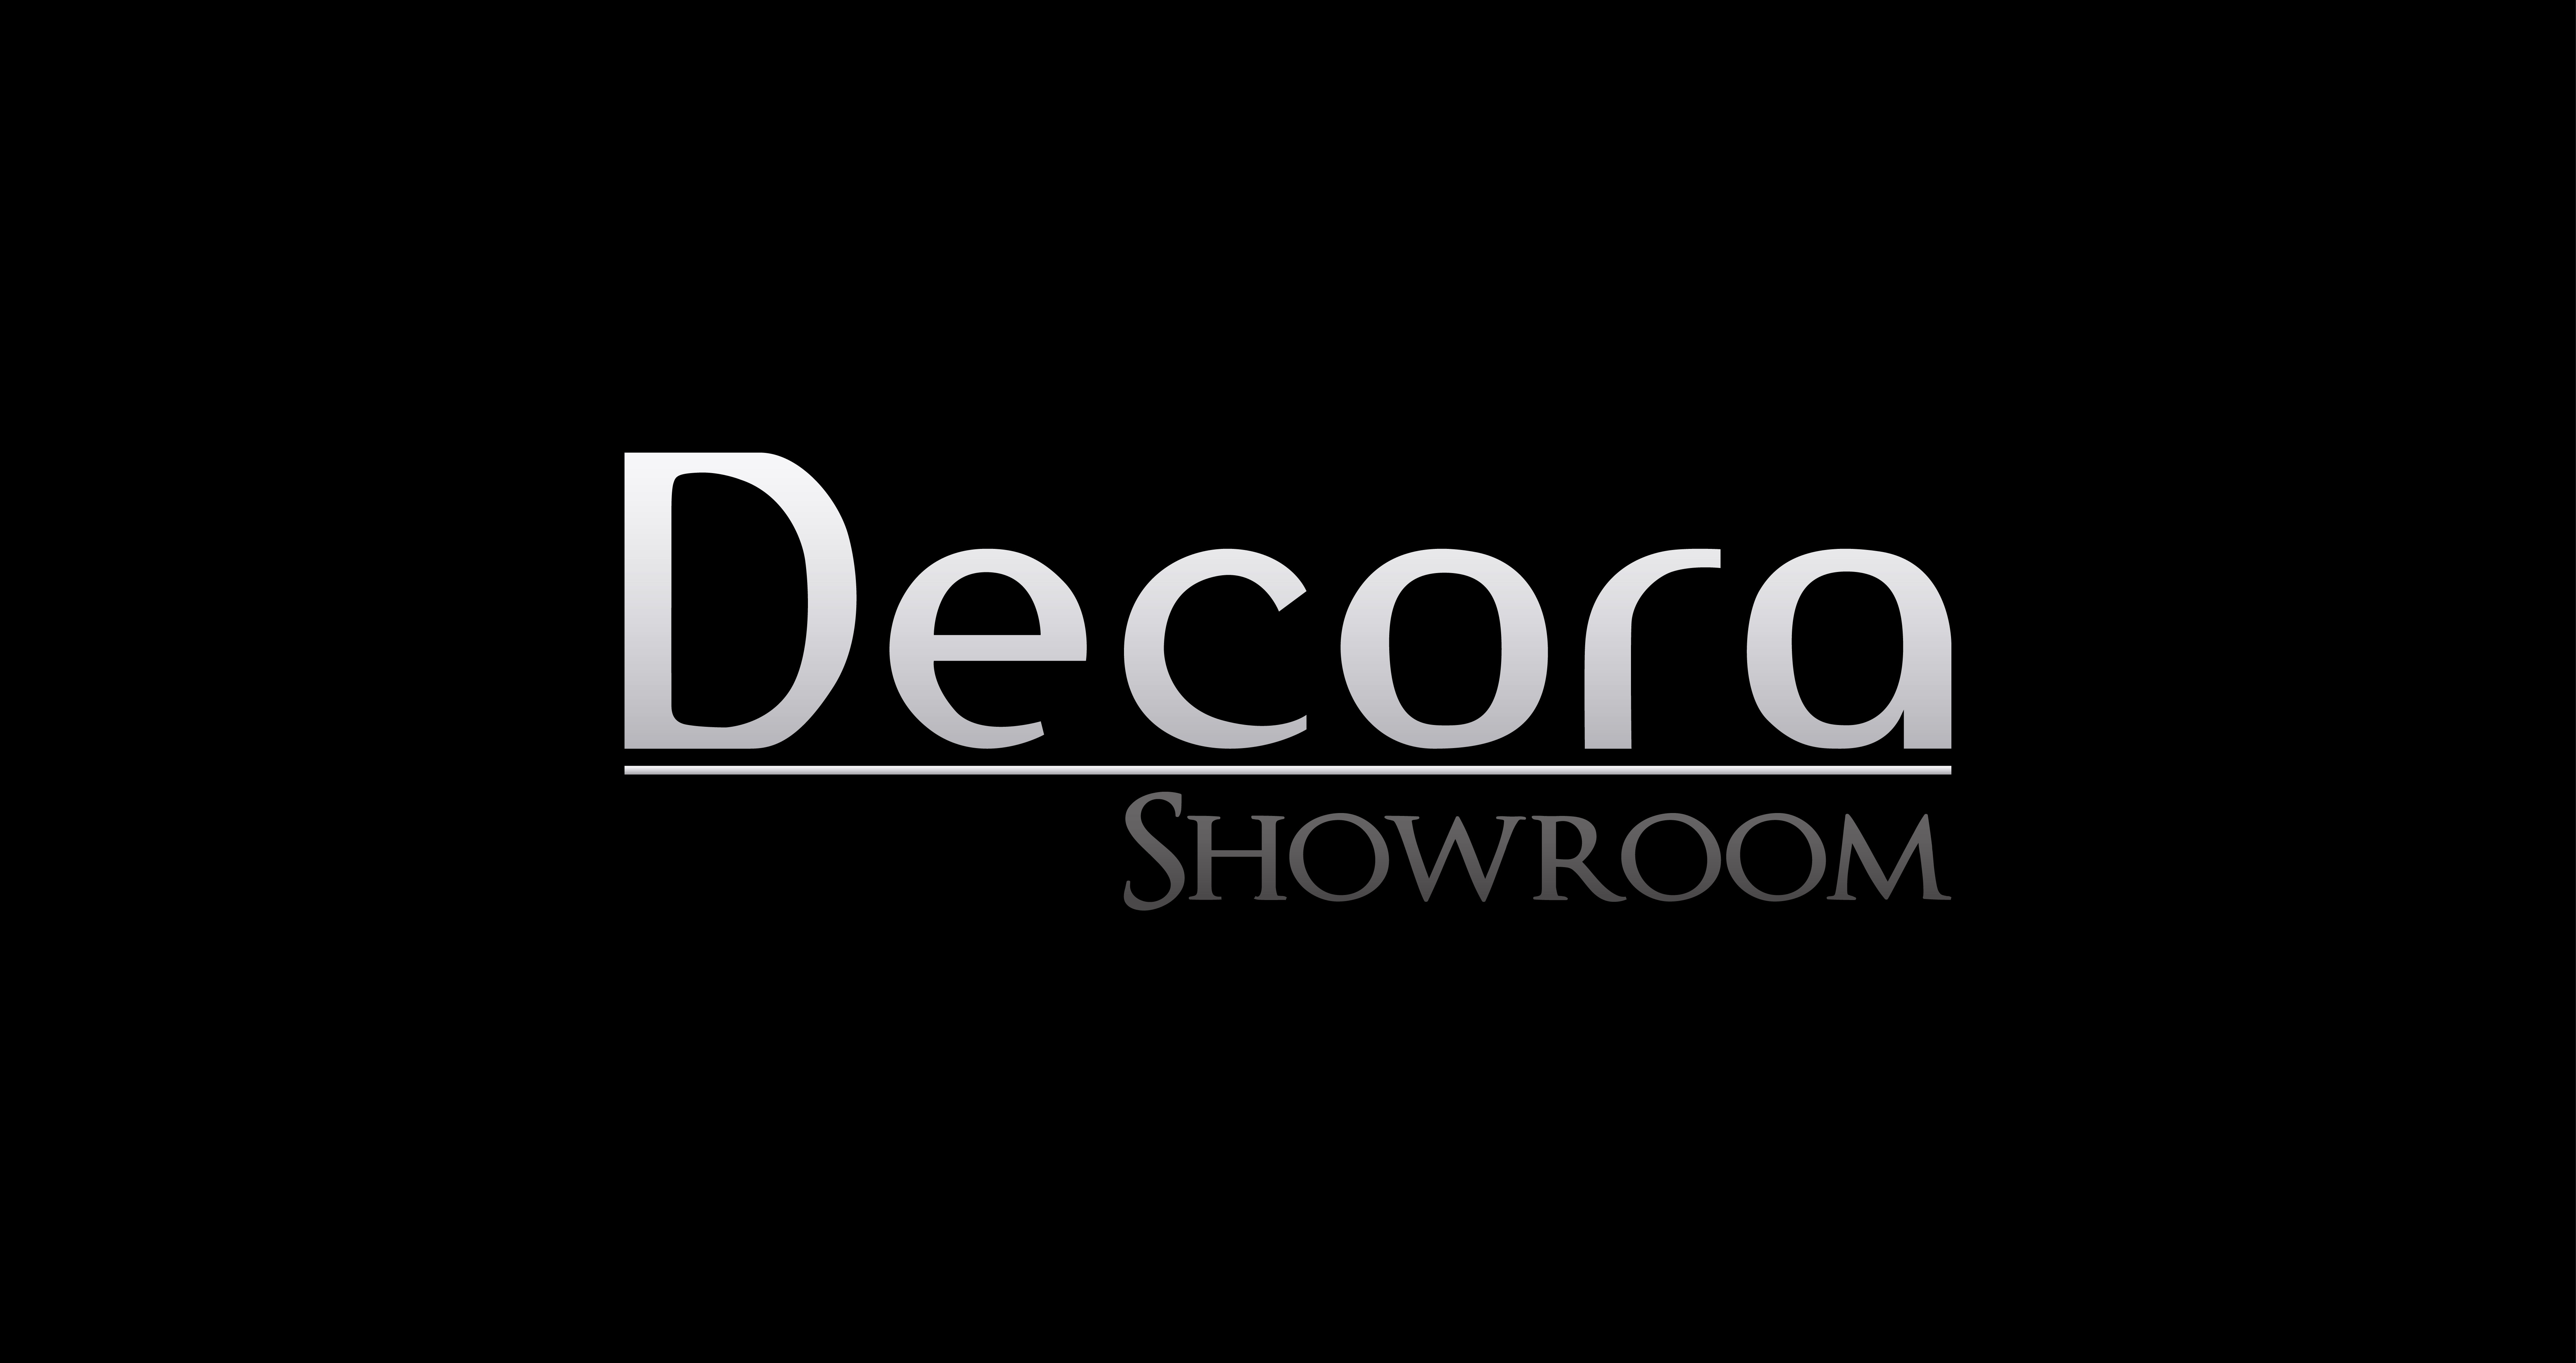 Decora Showroom